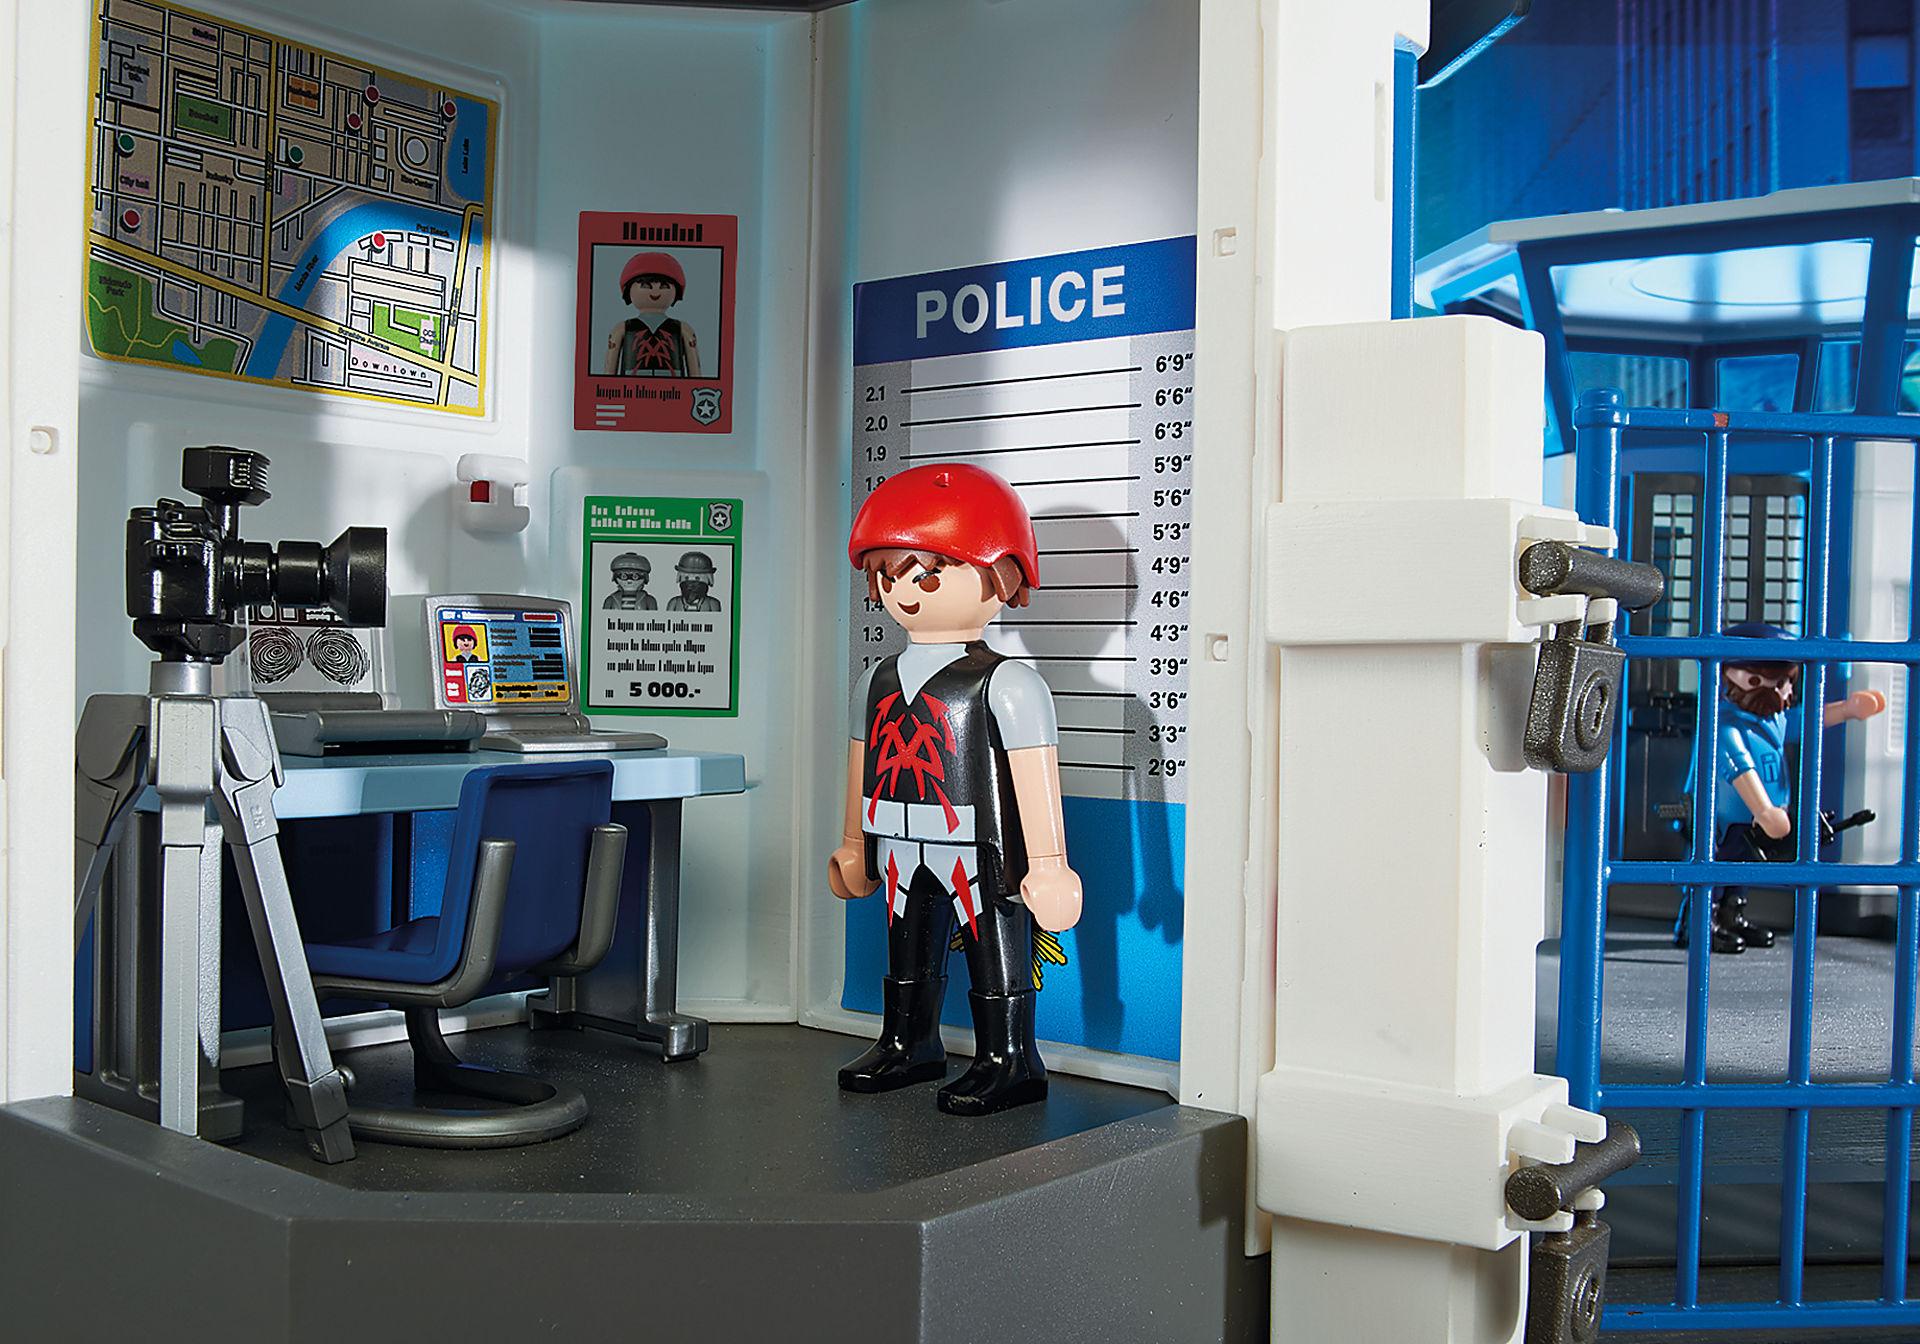 http://media.playmobil.com/i/playmobil/6872_product_extra1/Polizei-Kommandozentrale mit Gefängnis